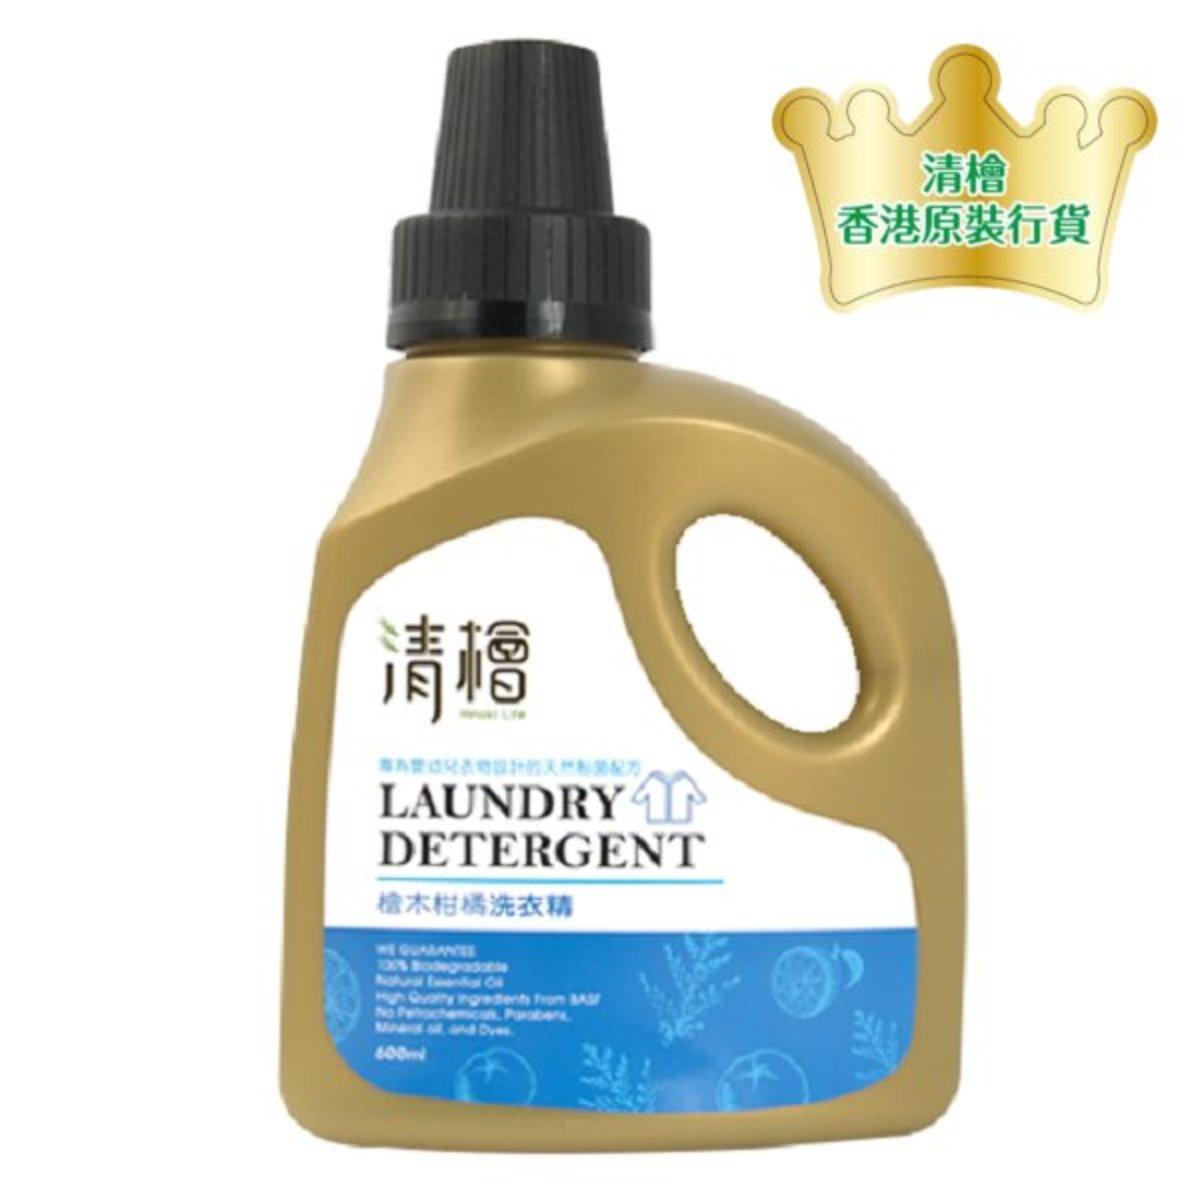 Cypress Citrus Laundry Detergent 600ML Natural sterilization SGS certification [Hong Kong original licensed]